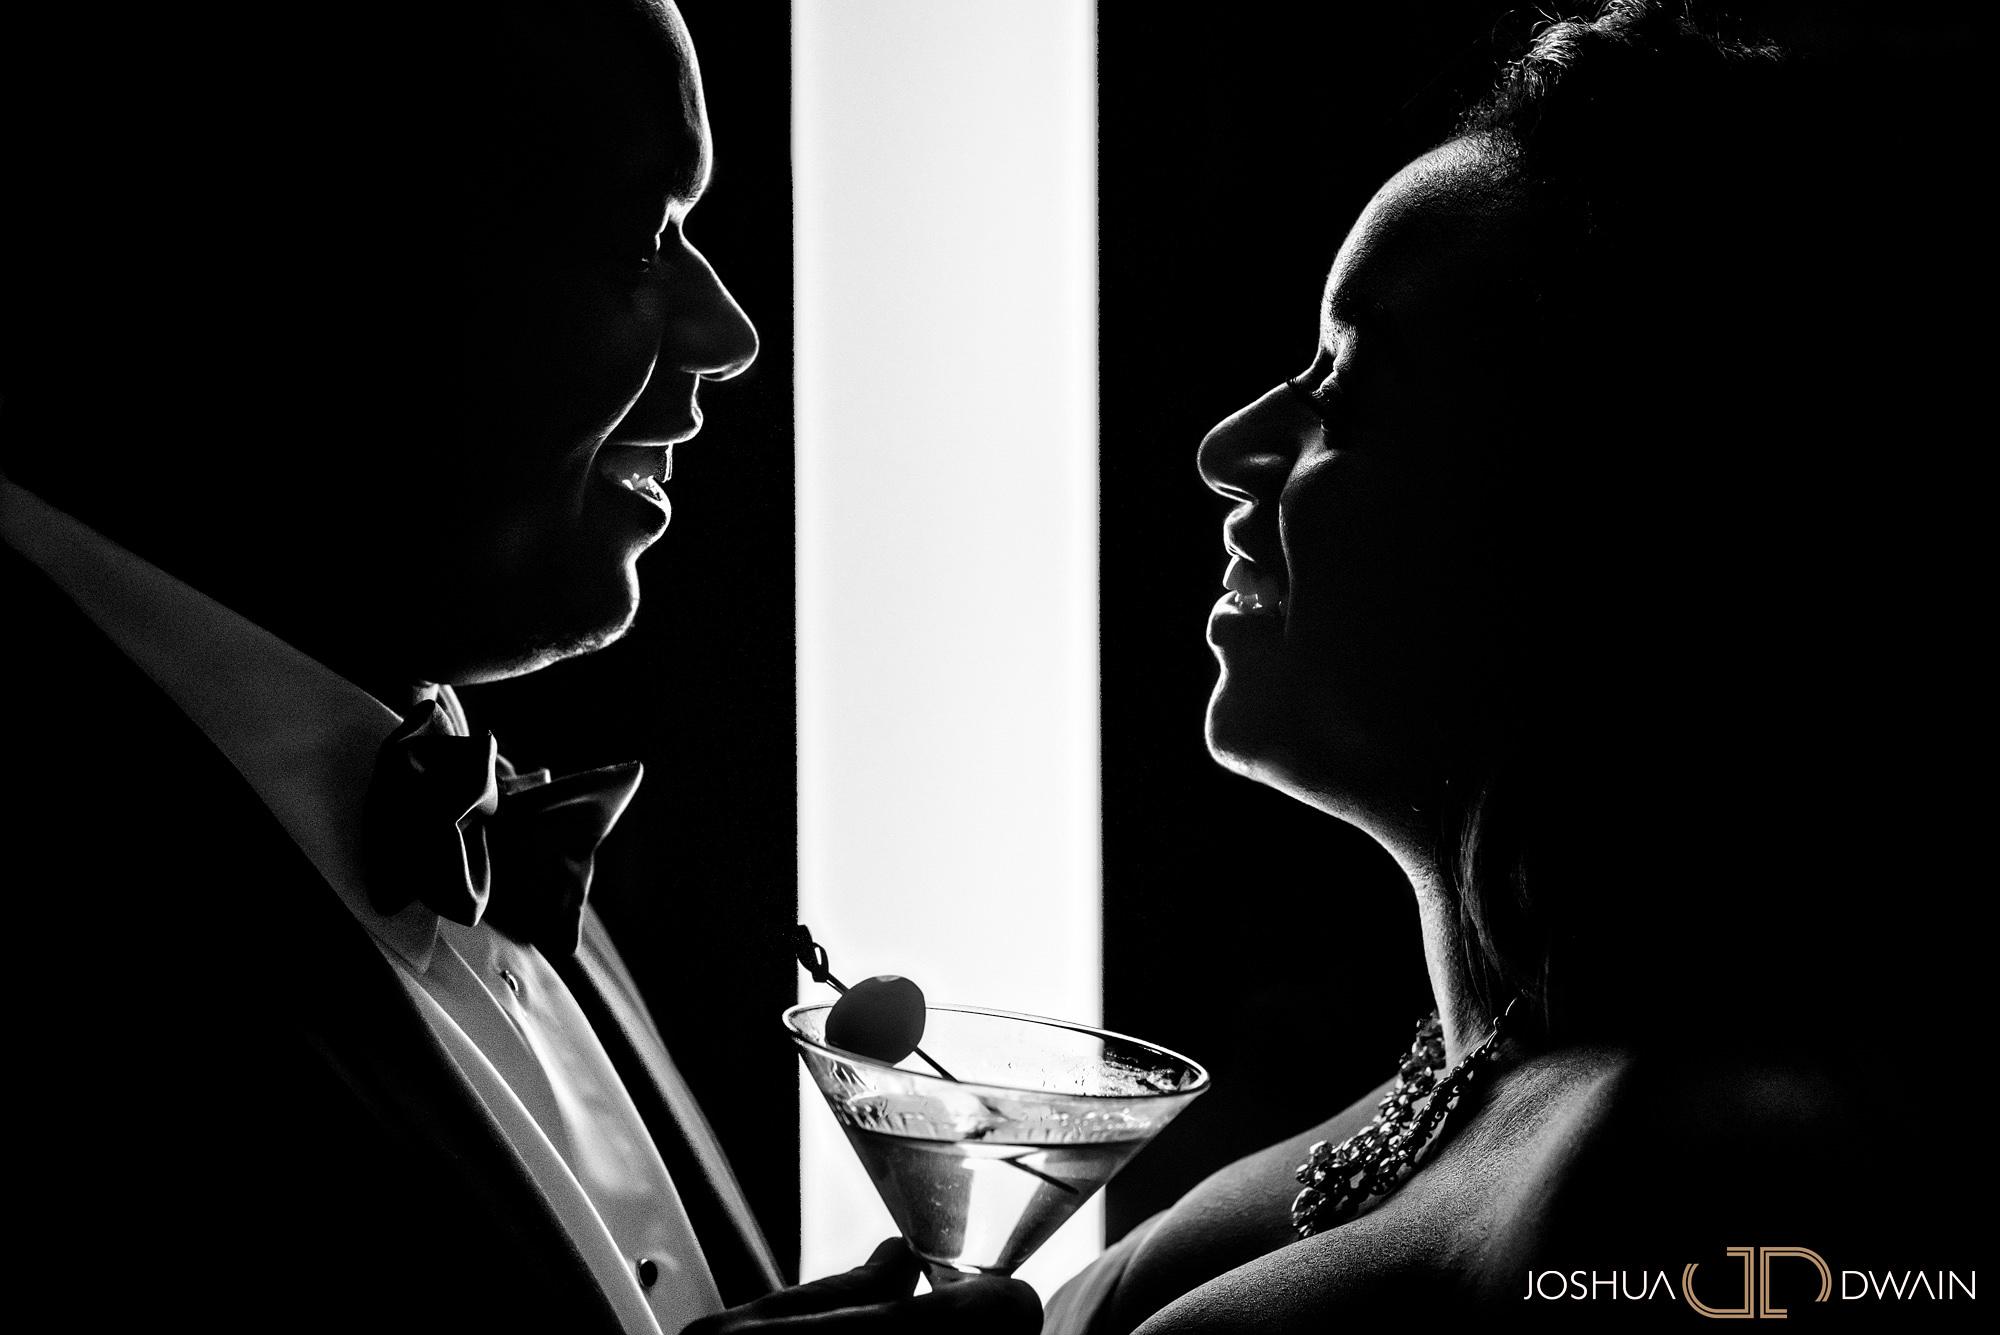 joshua-dwain-weddings-gallery-best-wedding-photographers-us-060